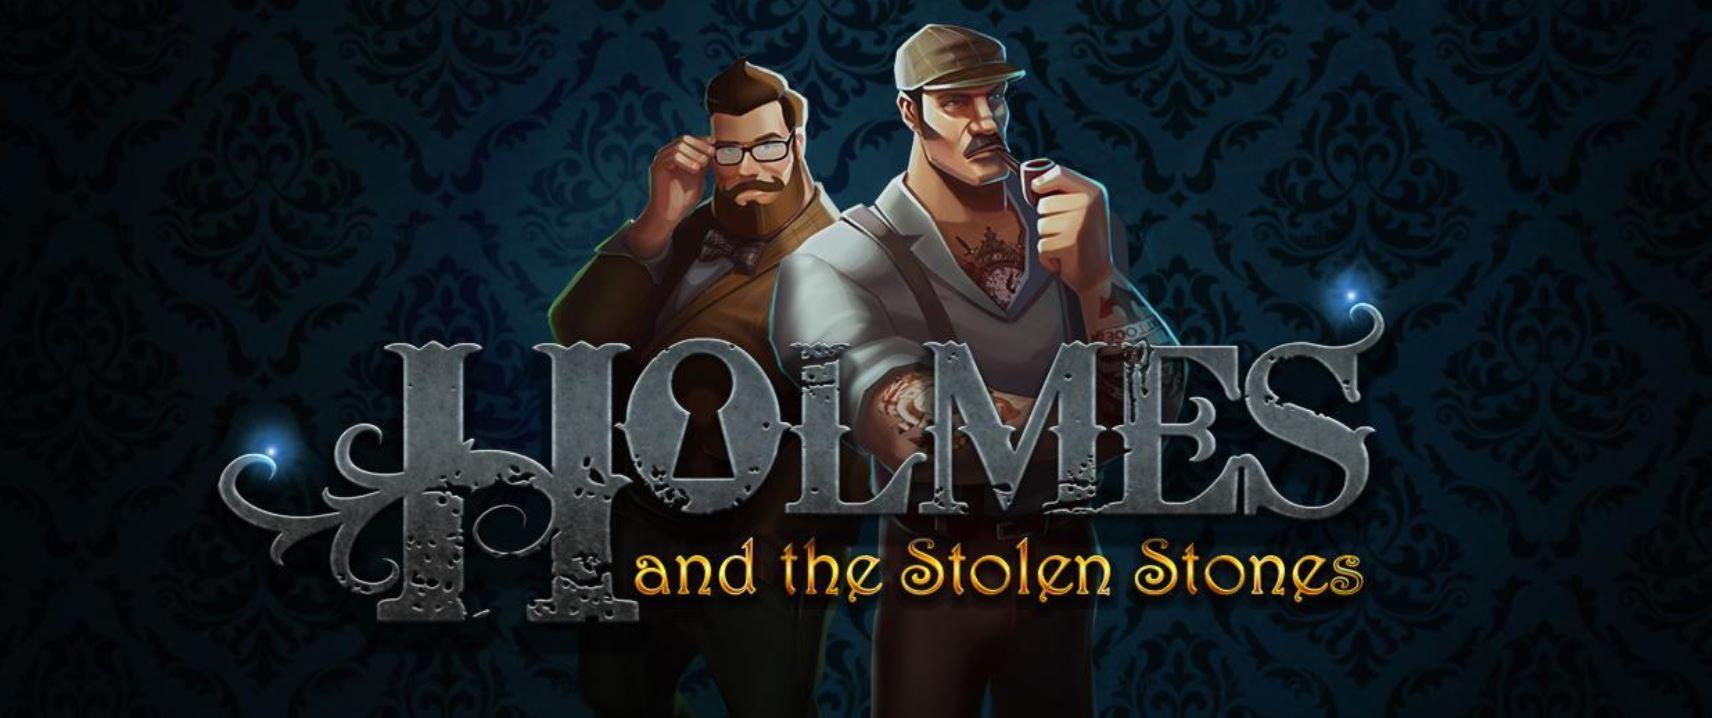 Holmes Stolen Stones slot